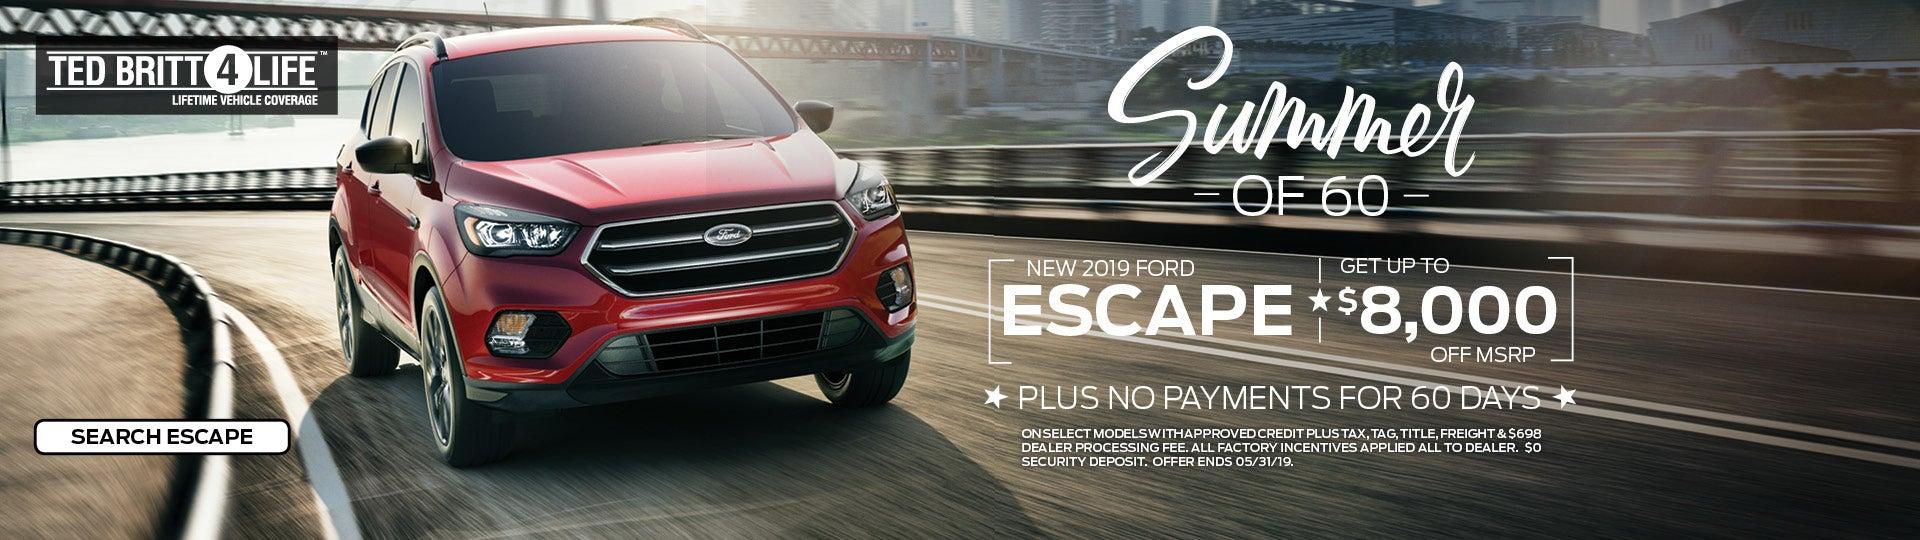 New 2019 Escape | Ted Britt Ford of Chantilly | VA Dealership